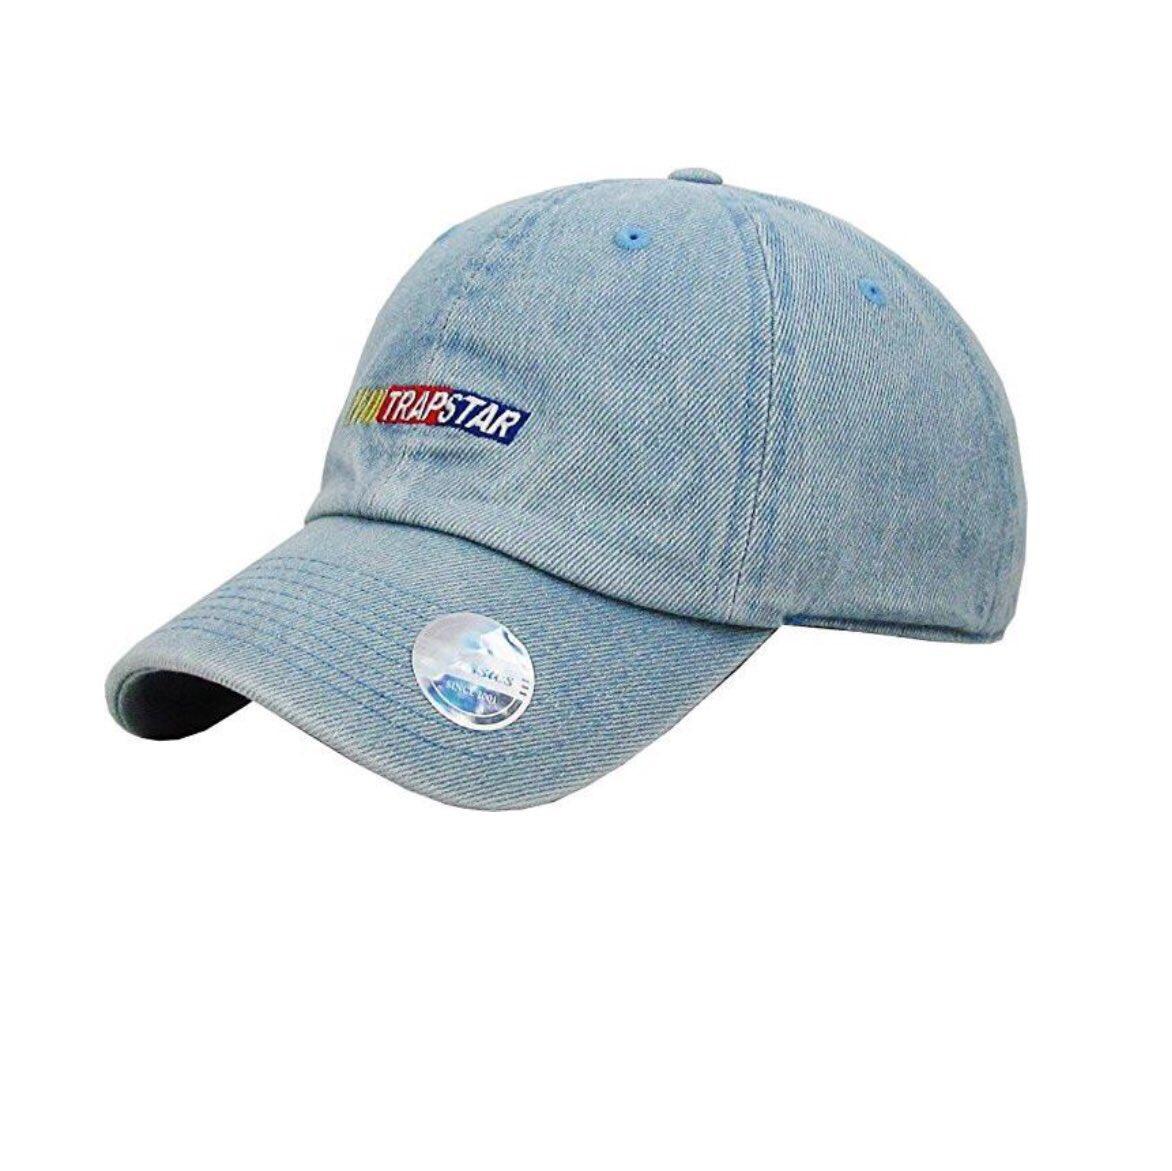 Trapstar Dad Hat 🎩   Shop: https://t.co/...